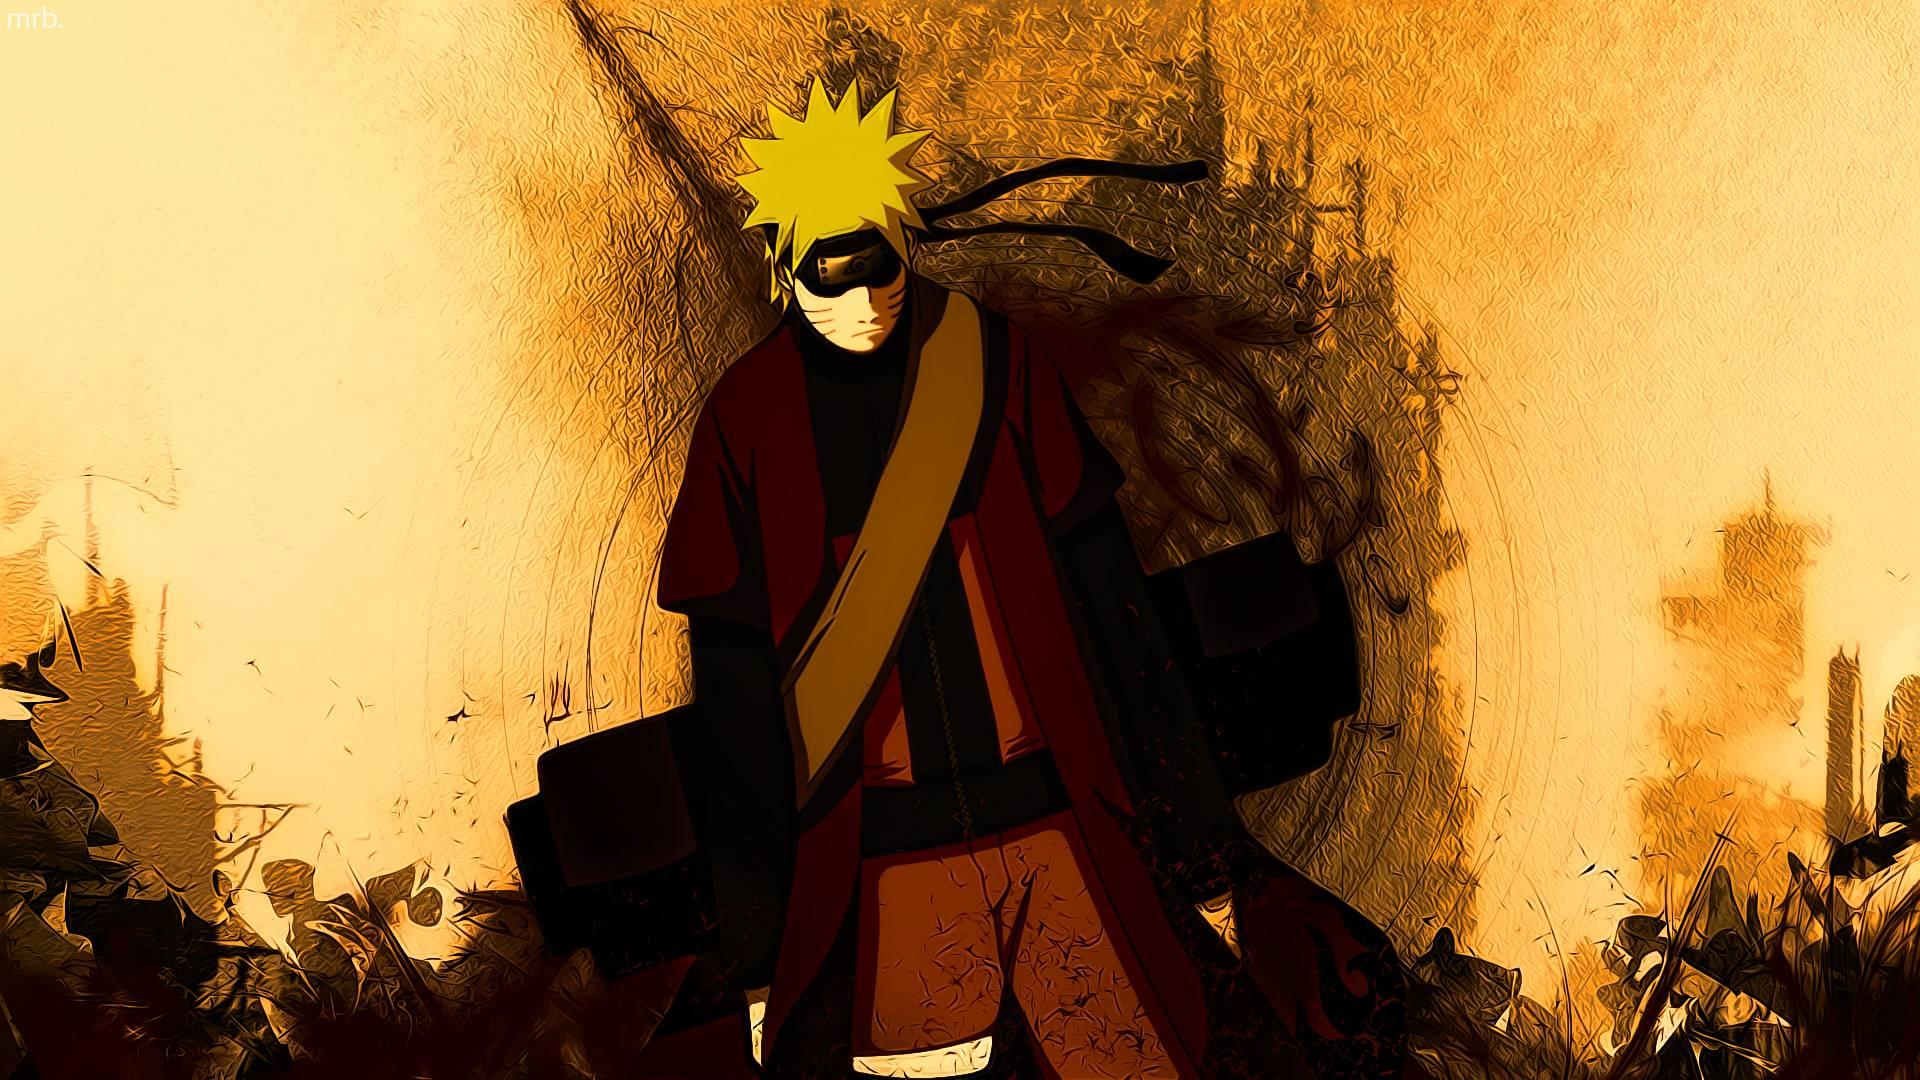 HD Naruto Wallpapers 1920x1080